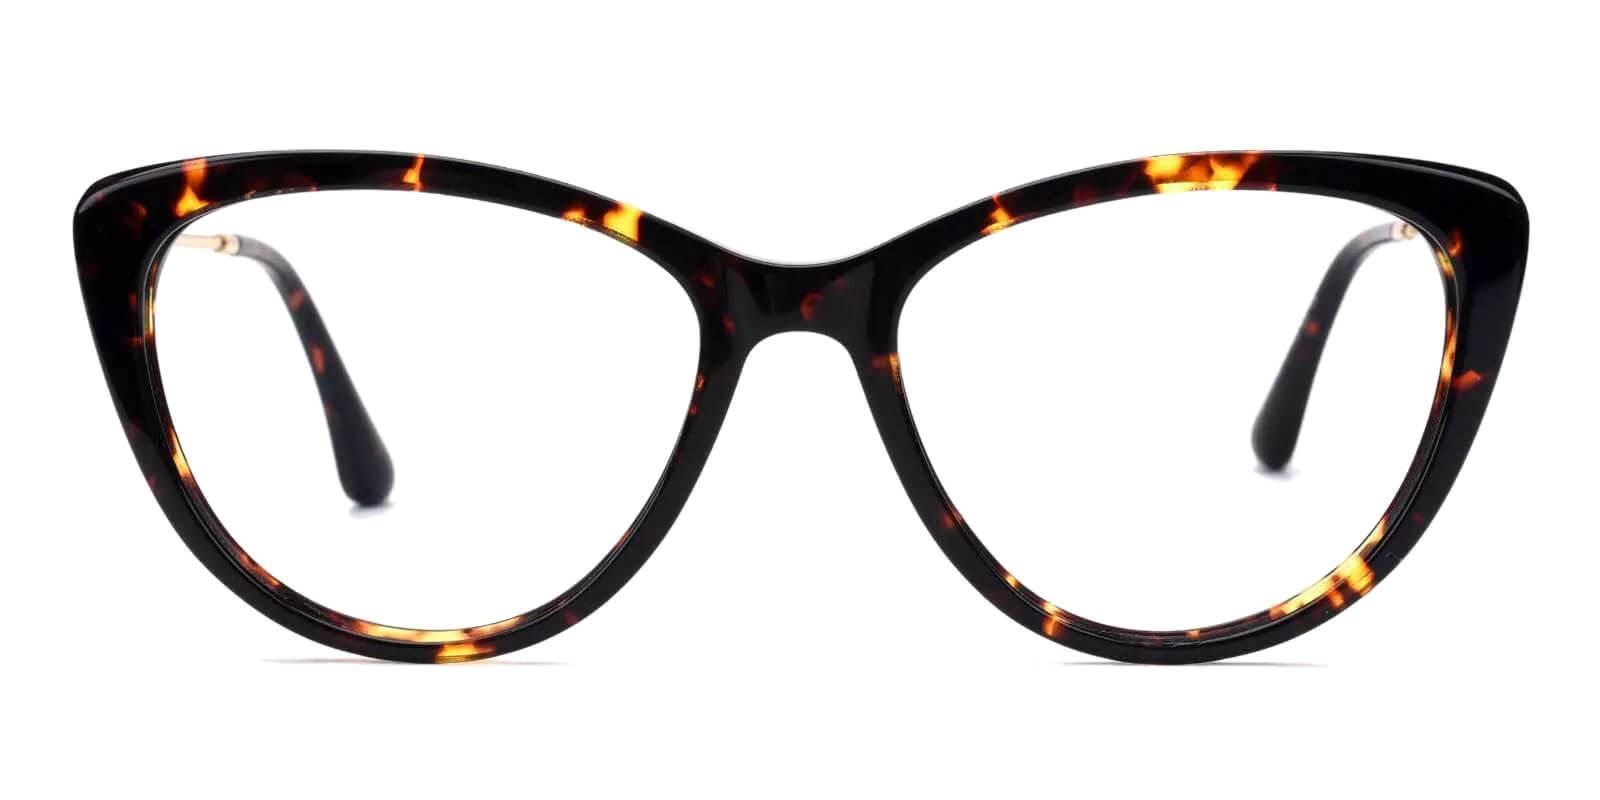 Satin Tortoise Metal , Acetate SpringHinges , Fashion , UniversalBridgeFit , Eyeglasses Frames from ABBE Glasses